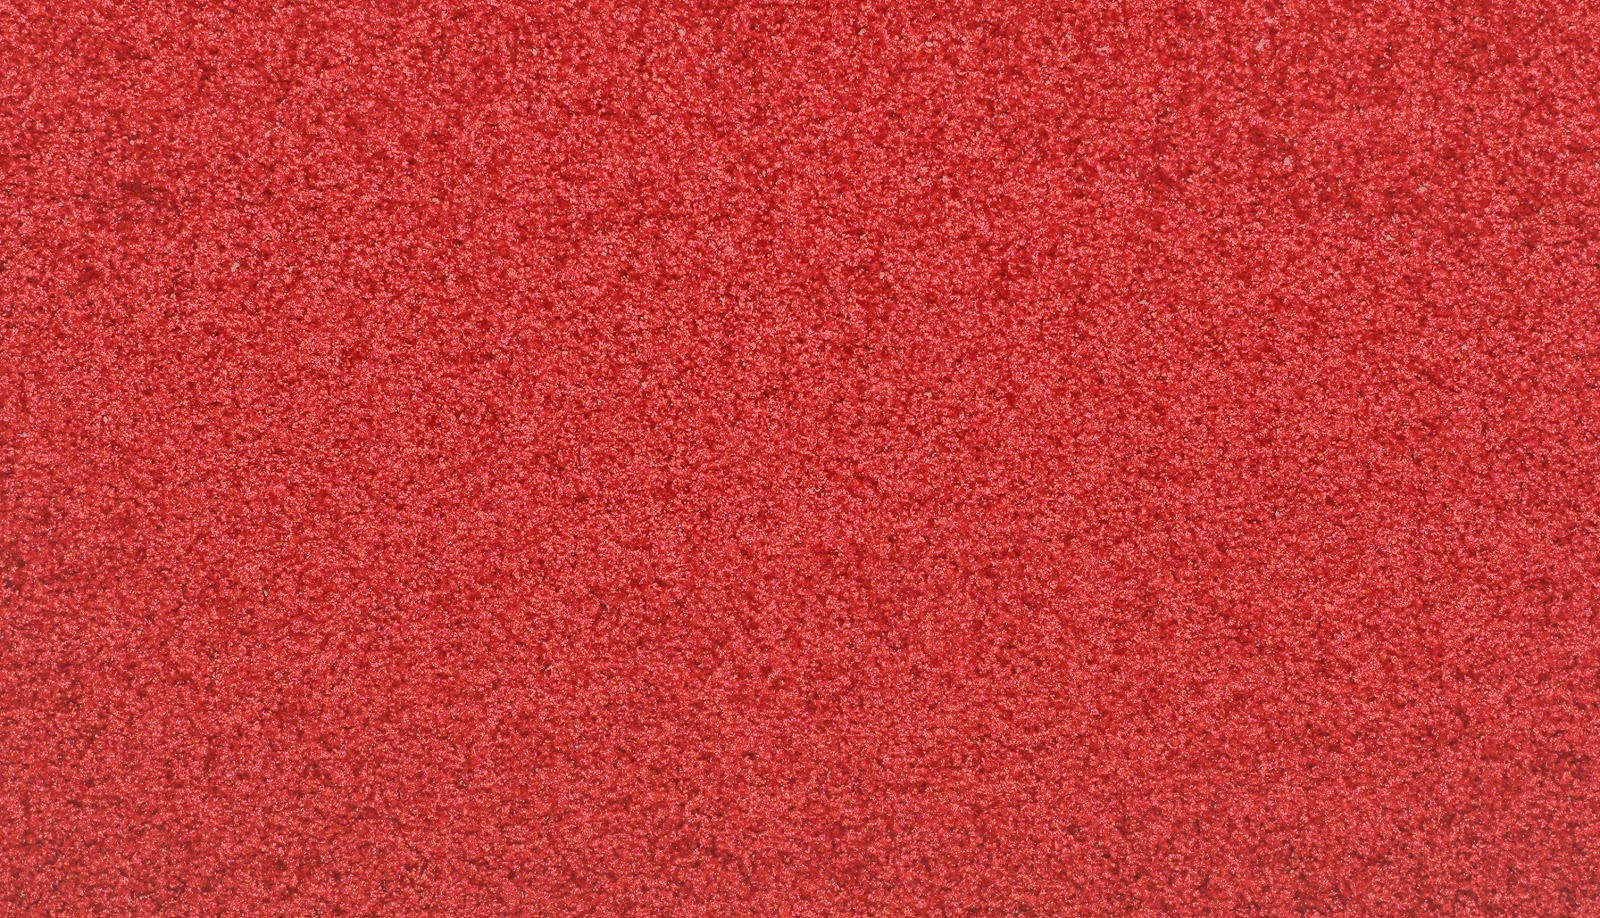 Red Cushion Texture